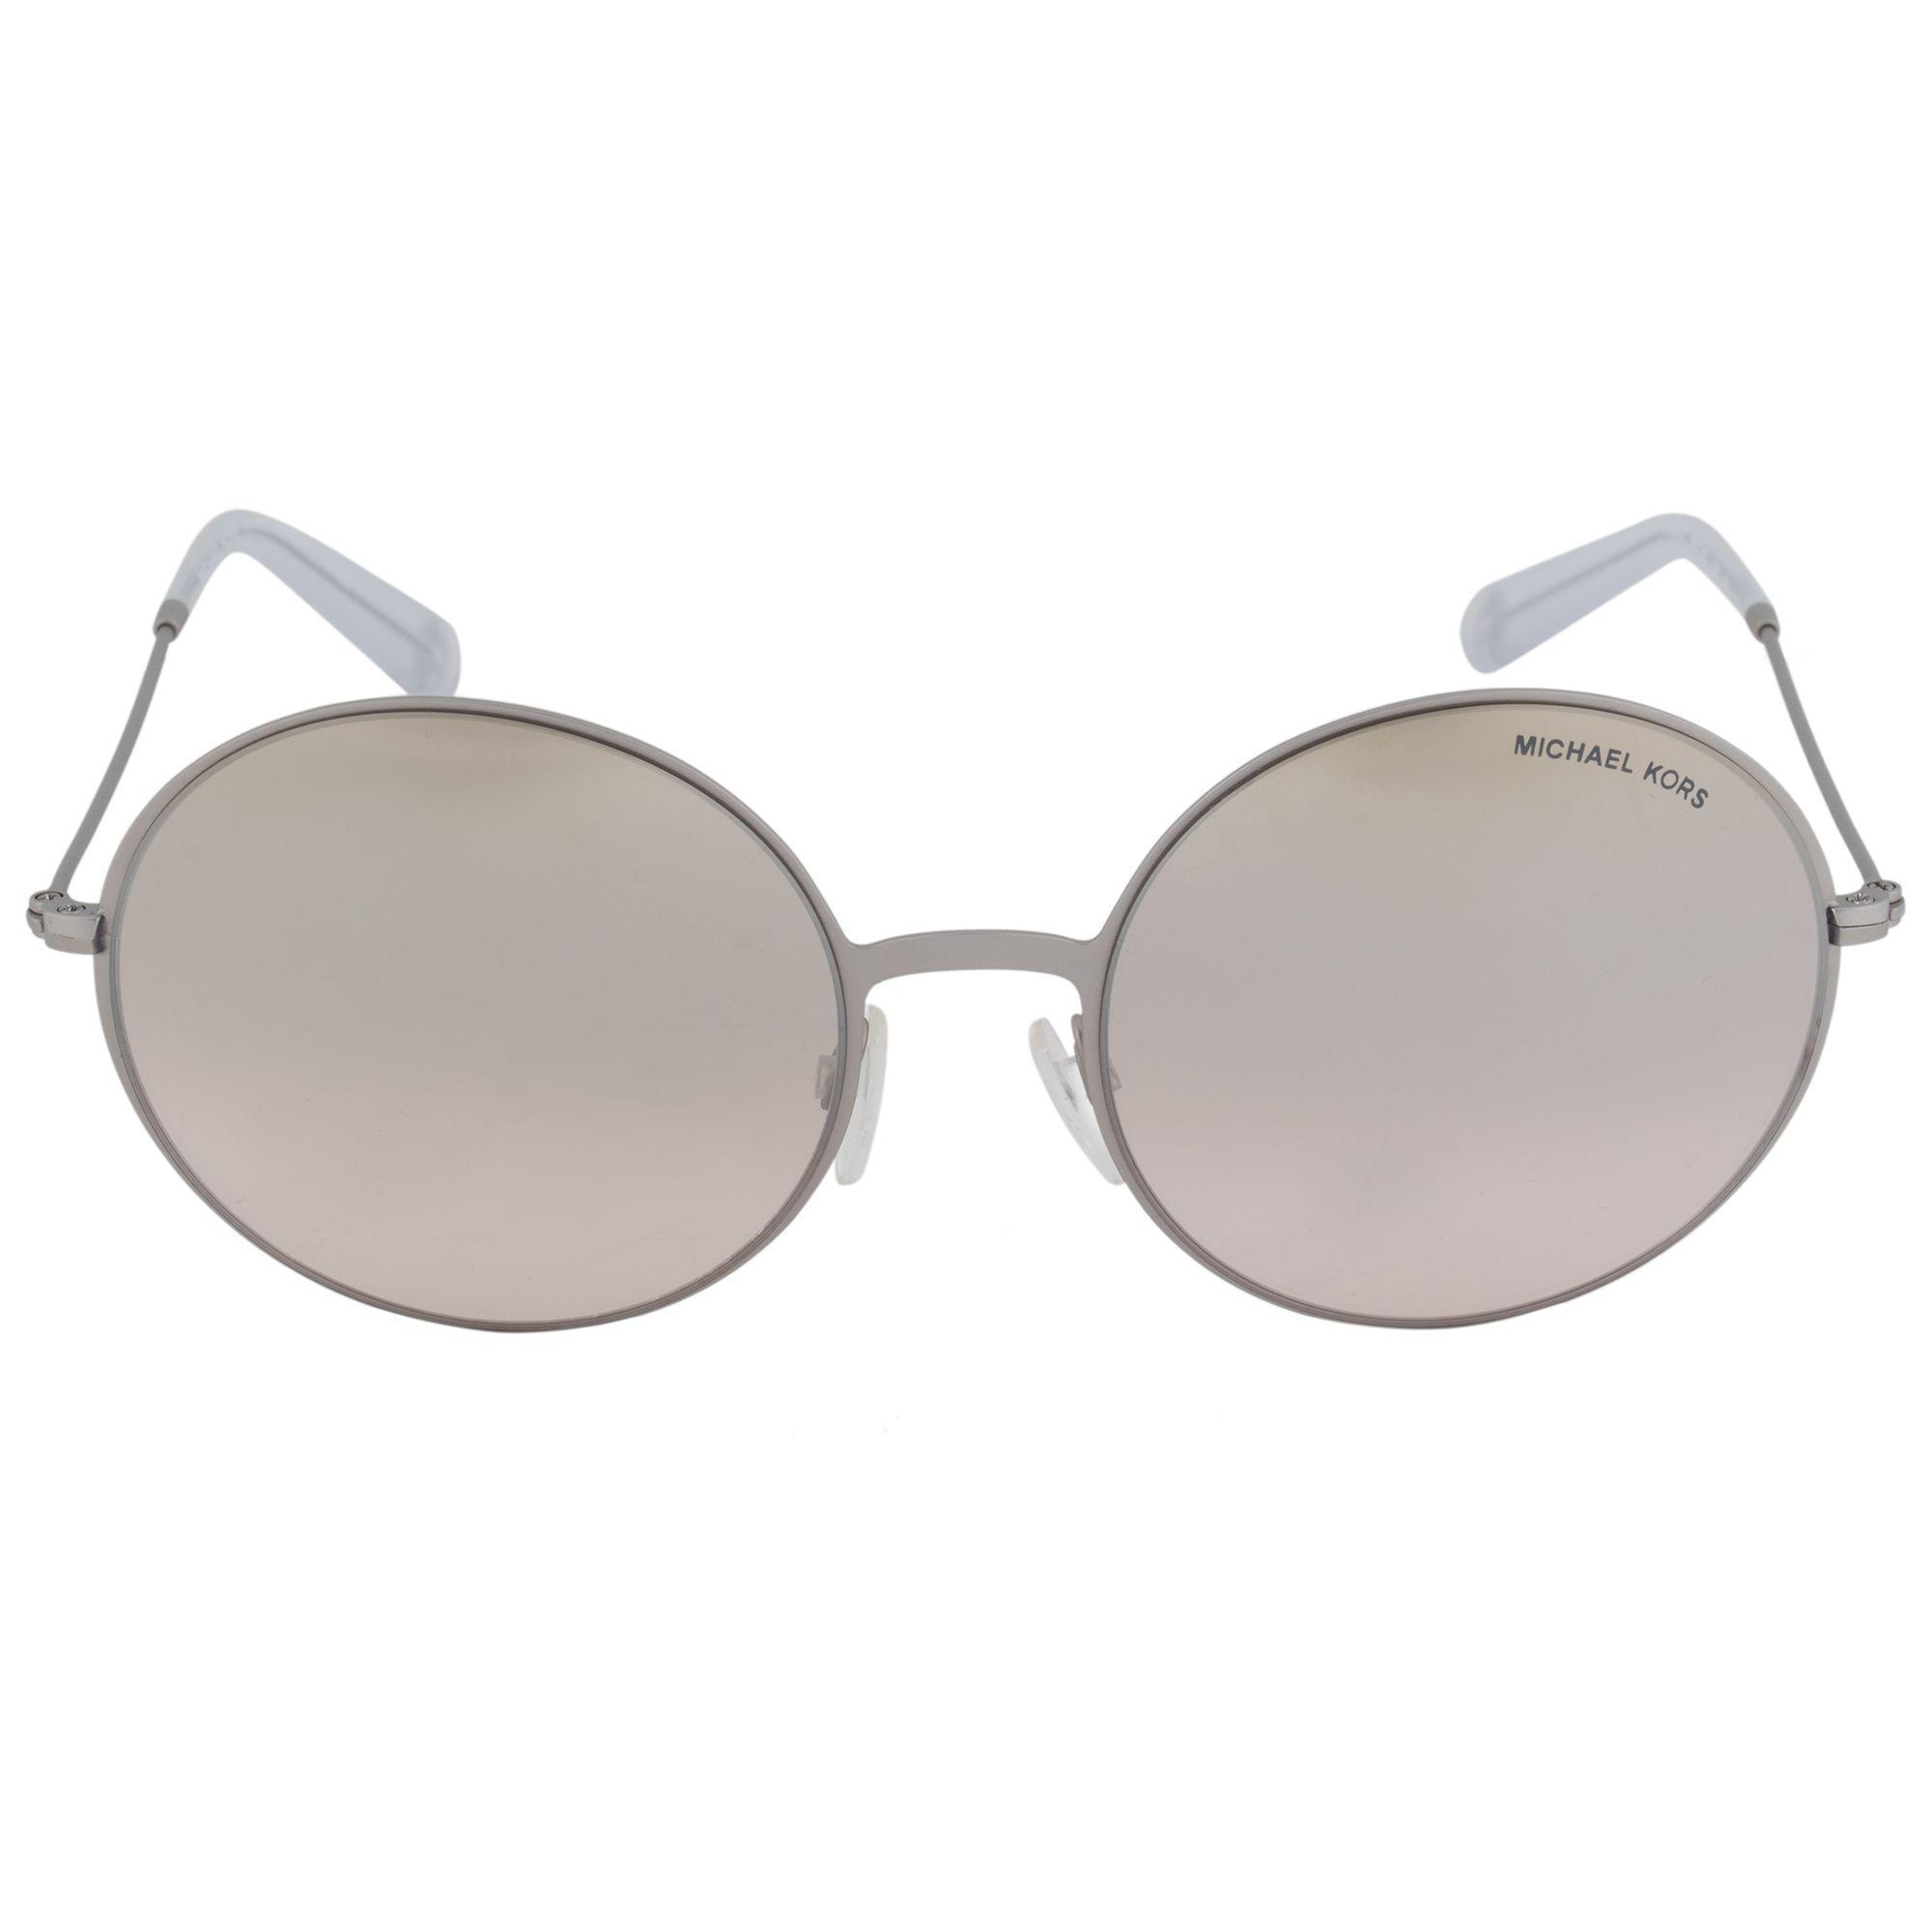 773e615ad95e Michael Kors - Multicolor Kendall Ll Round Sunglasses Mk5017 11398z 55 |  Brushed Silver Frame |. View fullscreen